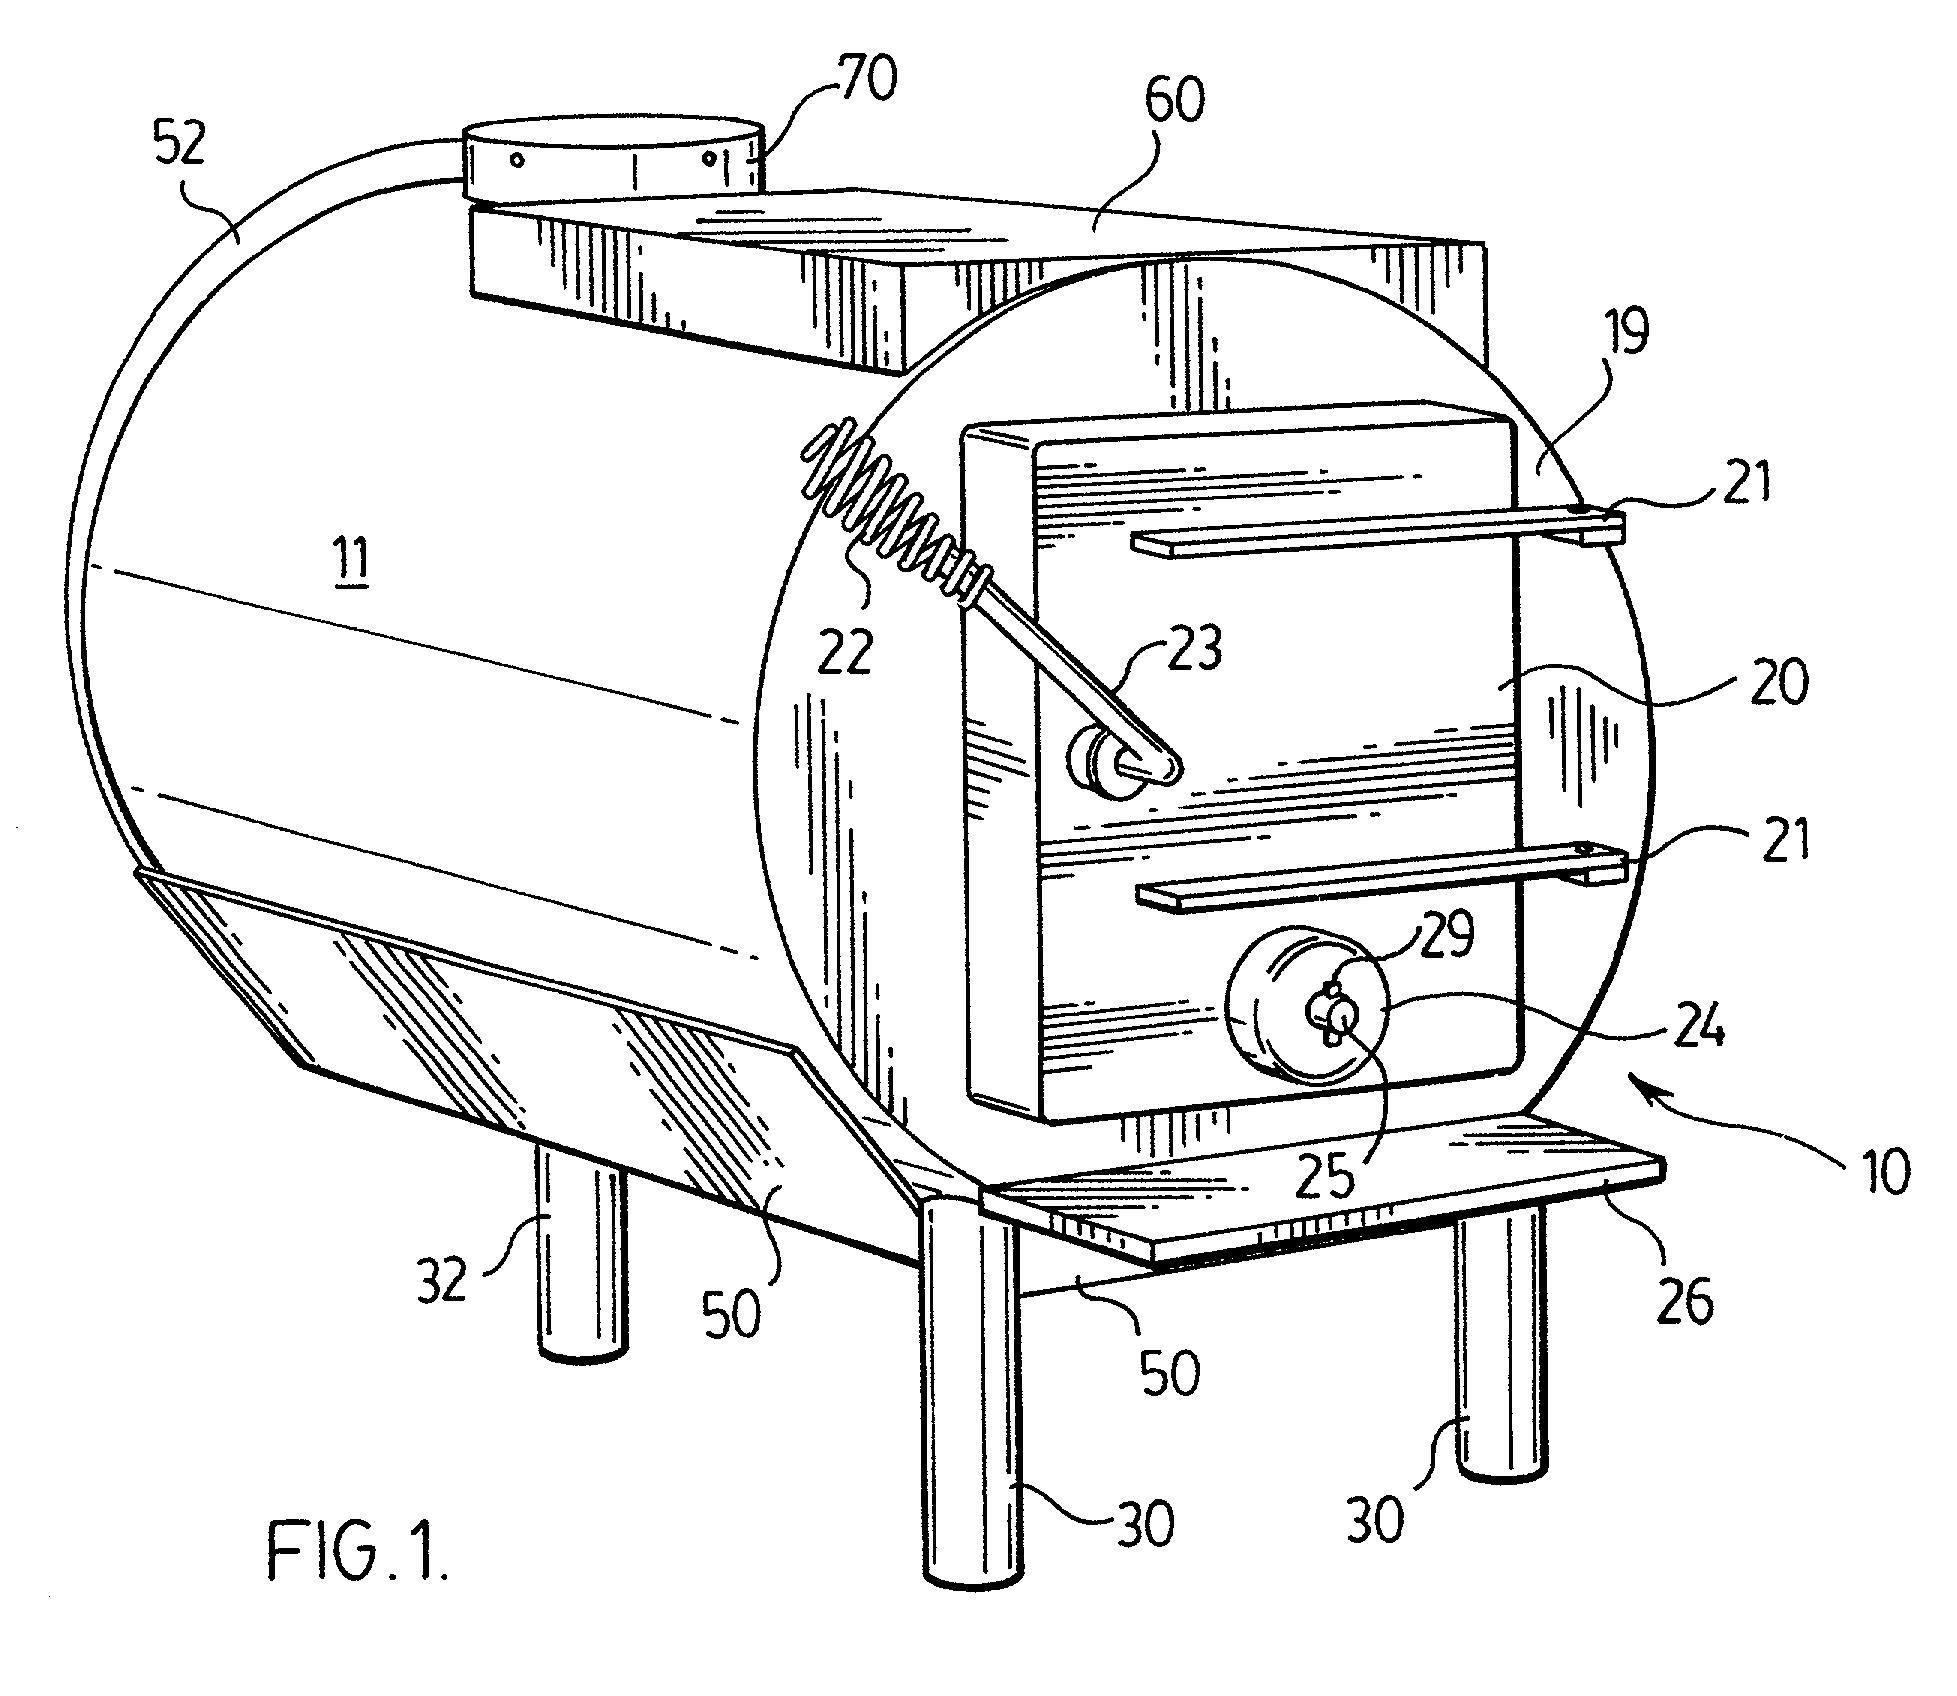 patent us20010037803 - wood burning stove